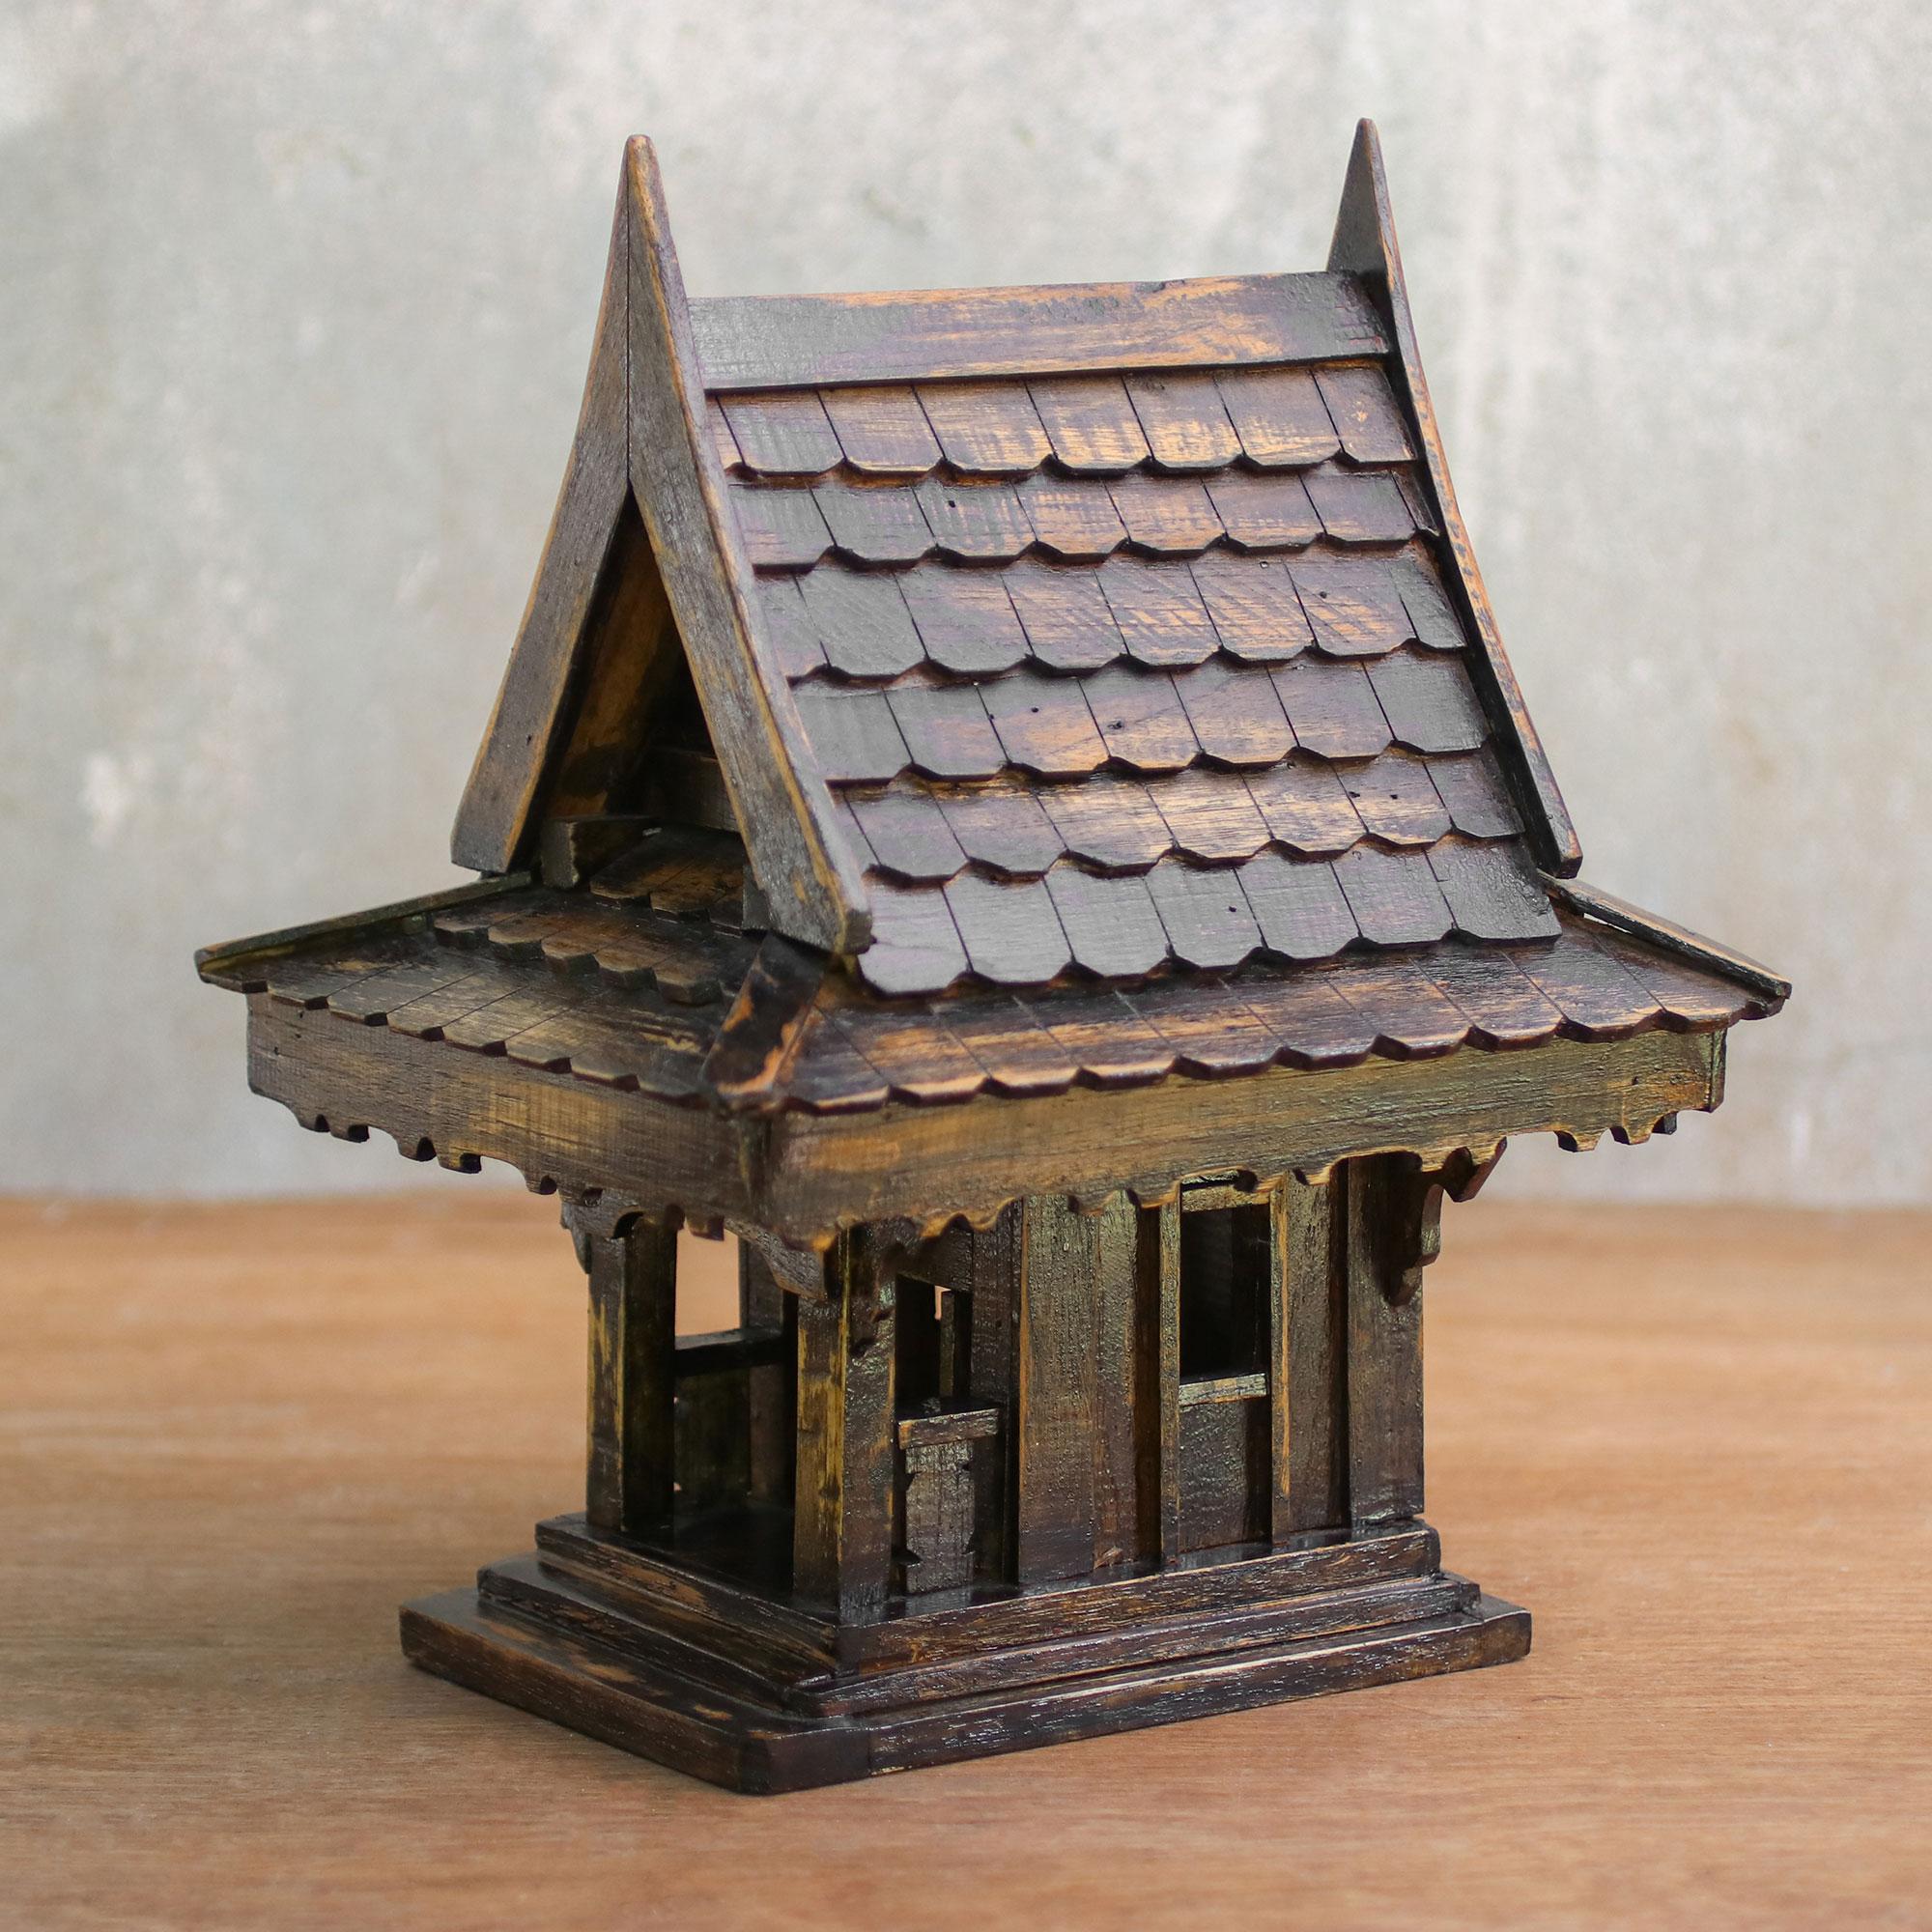 Teakwood Spirit House Decorative Accent From Thailand Thai Home